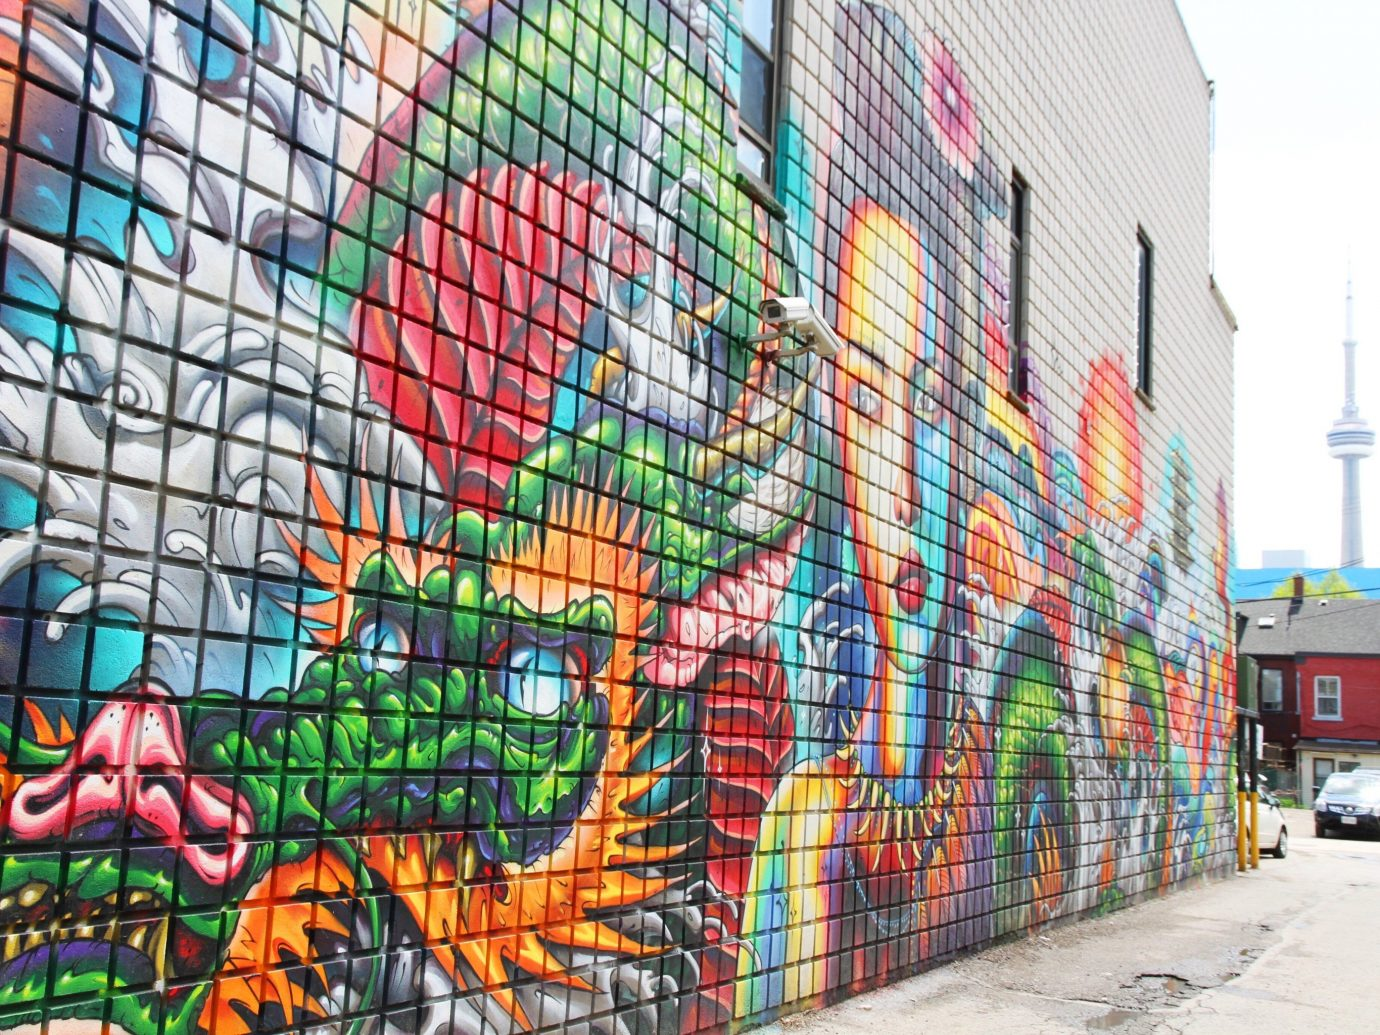 Offbeat Trip Ideas colorful outdoor graffiti wall neighbourhood art street art mural facade metropolis building window painted painting colored